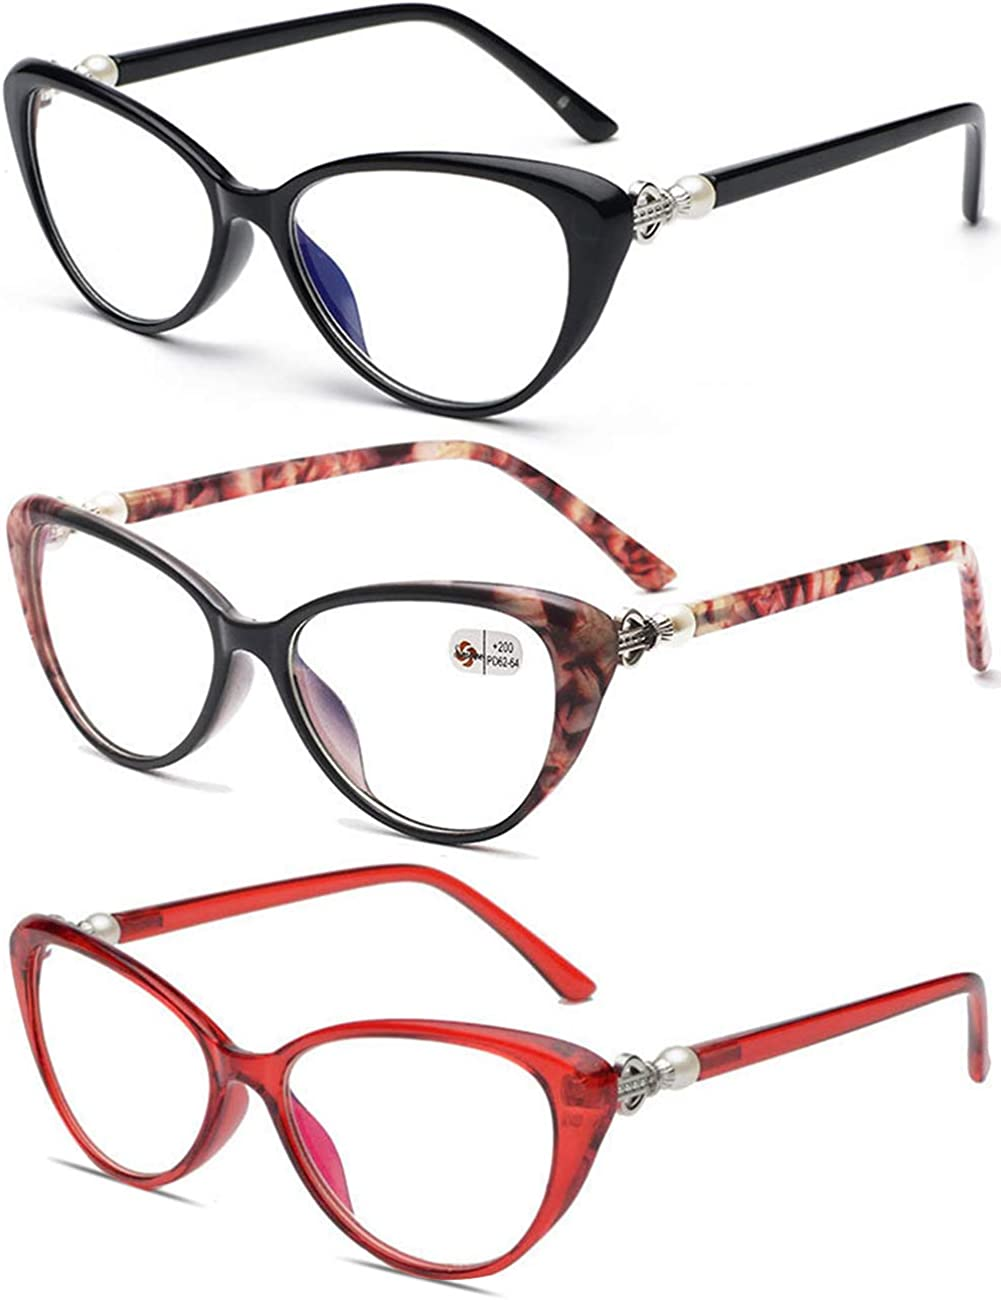 VEVESMUNDO Cateye Reading Glasses Ladies Women Men Anti Fatigue Retro Eyeglasses